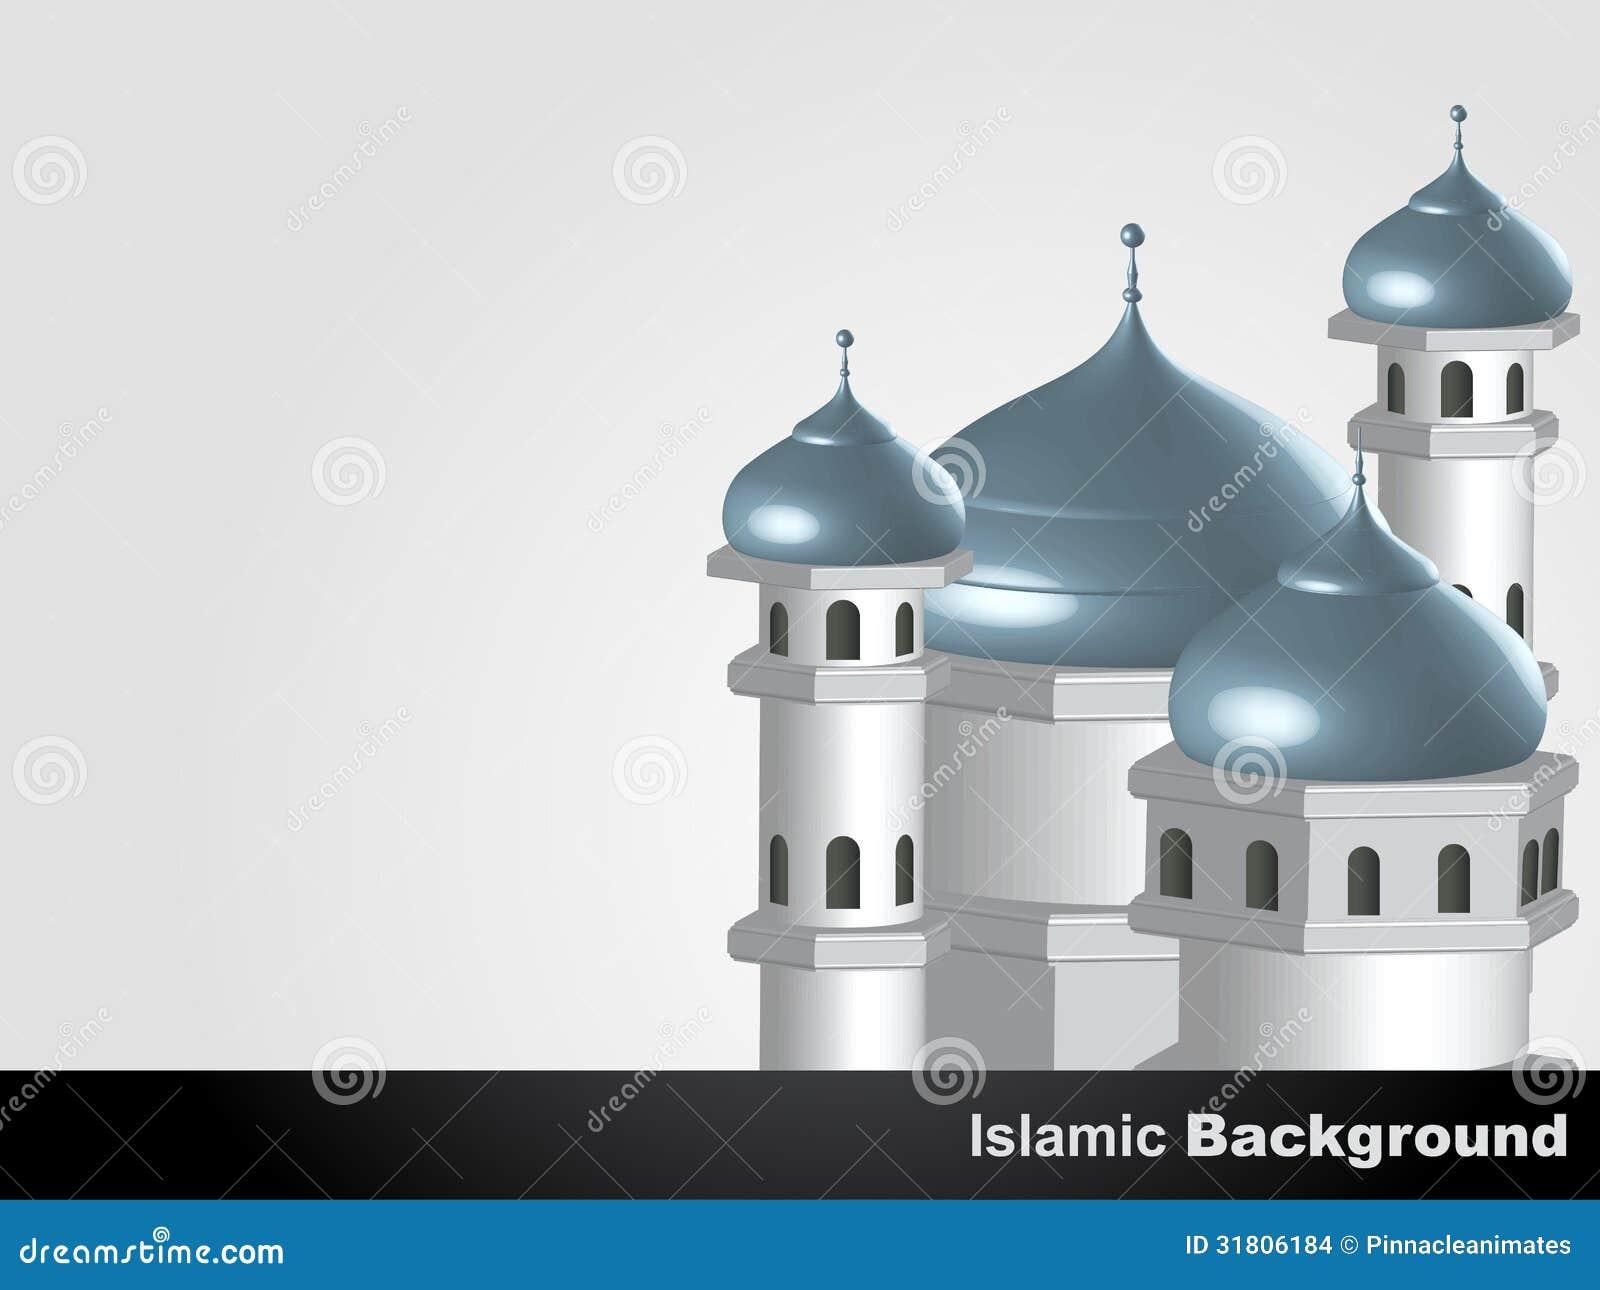 Islamic Mosque Background Stock Images - Image: 31806184